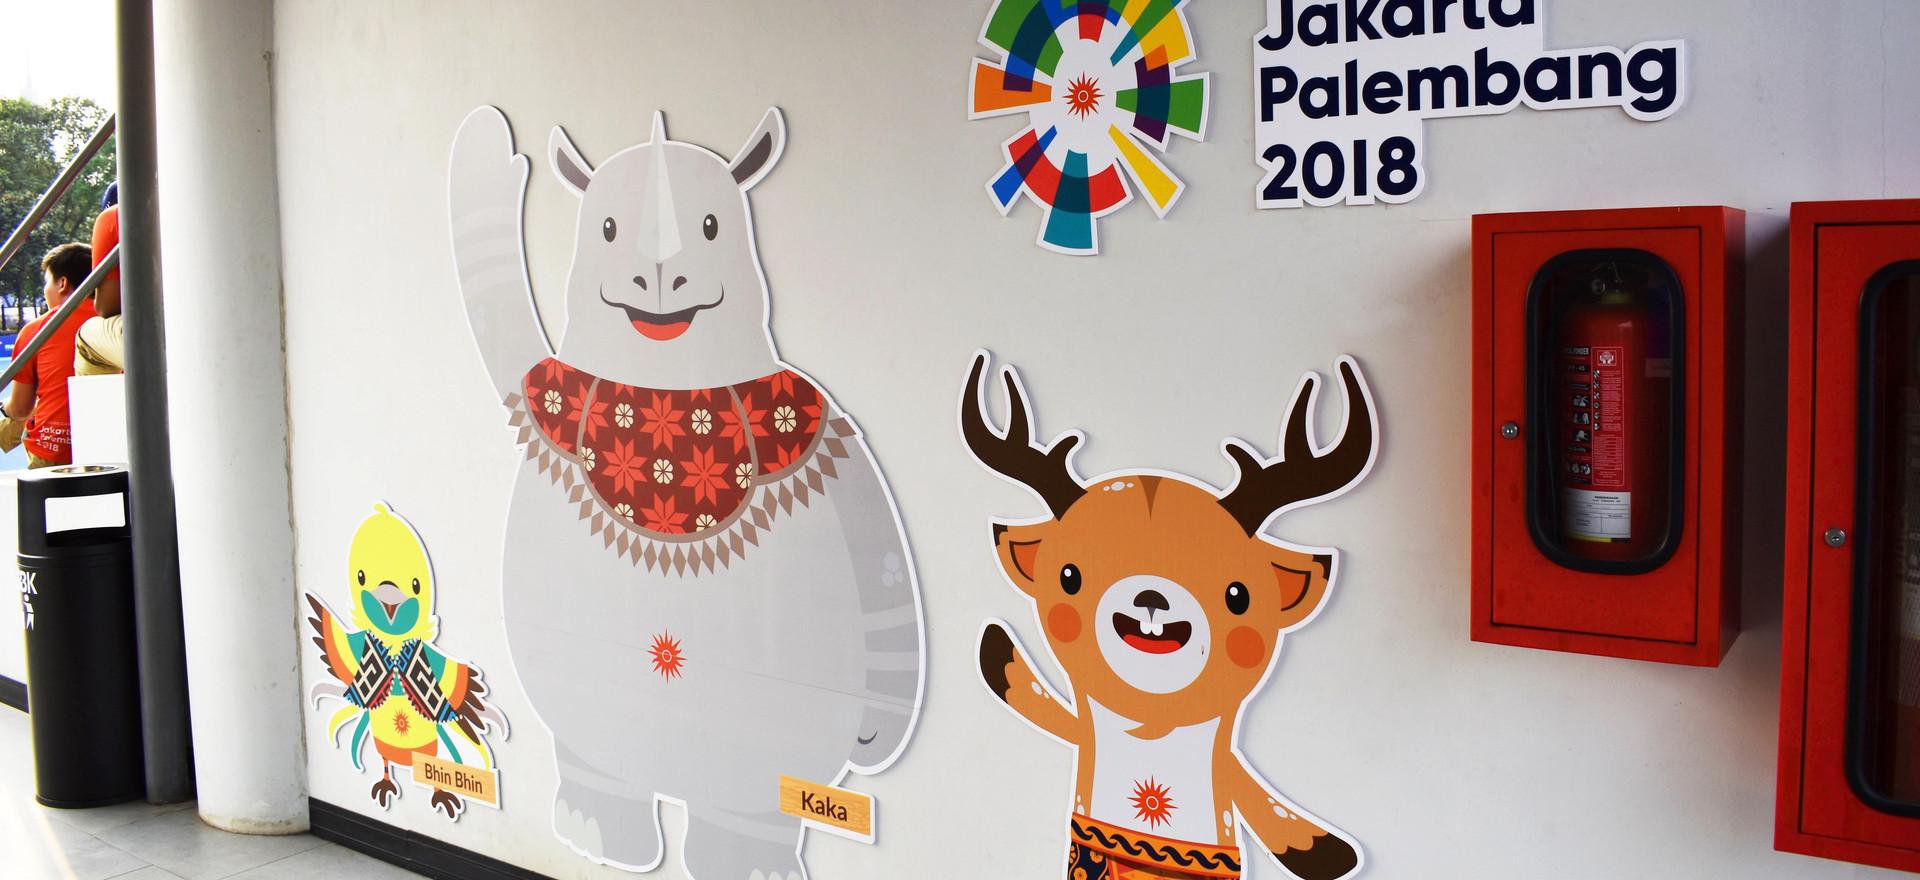 Asian Games 2018 GBK Beautification - Binbin, Kaka, Atung PVC Board/Forex Display